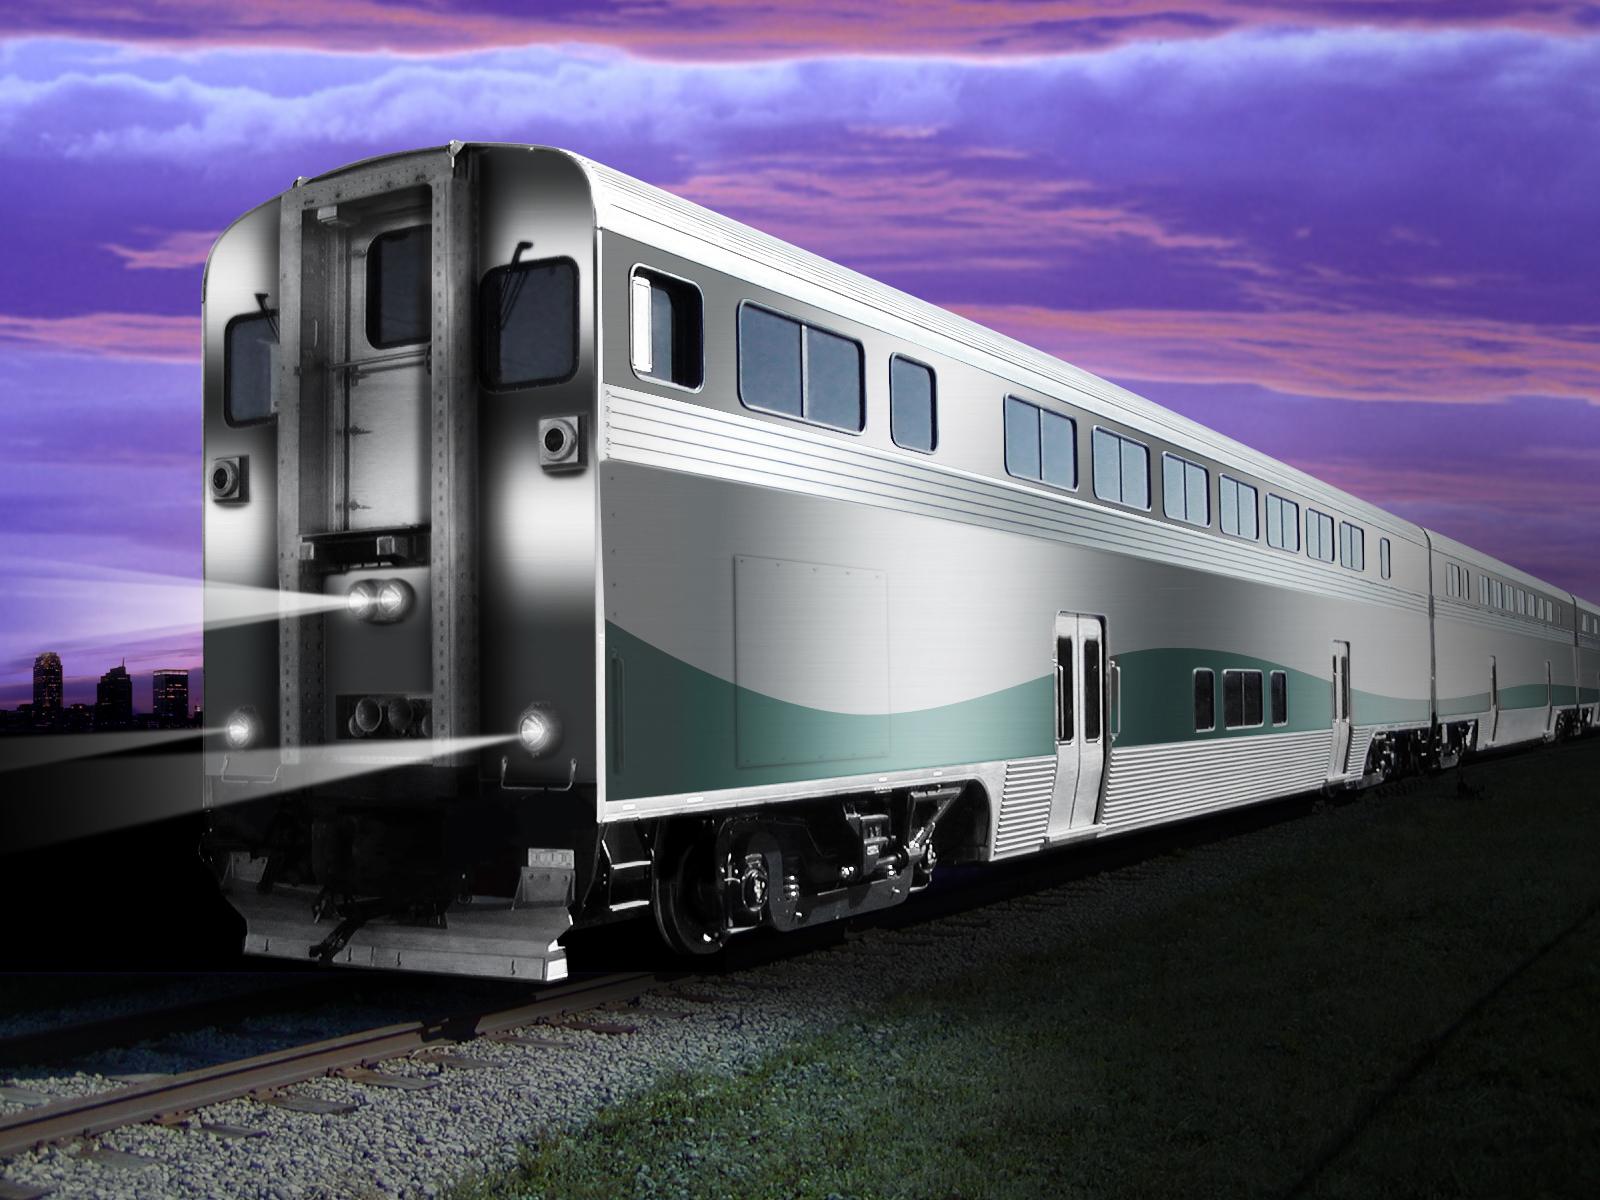 department of transportation opens bidding for made in america passenger rail cars us. Black Bedroom Furniture Sets. Home Design Ideas